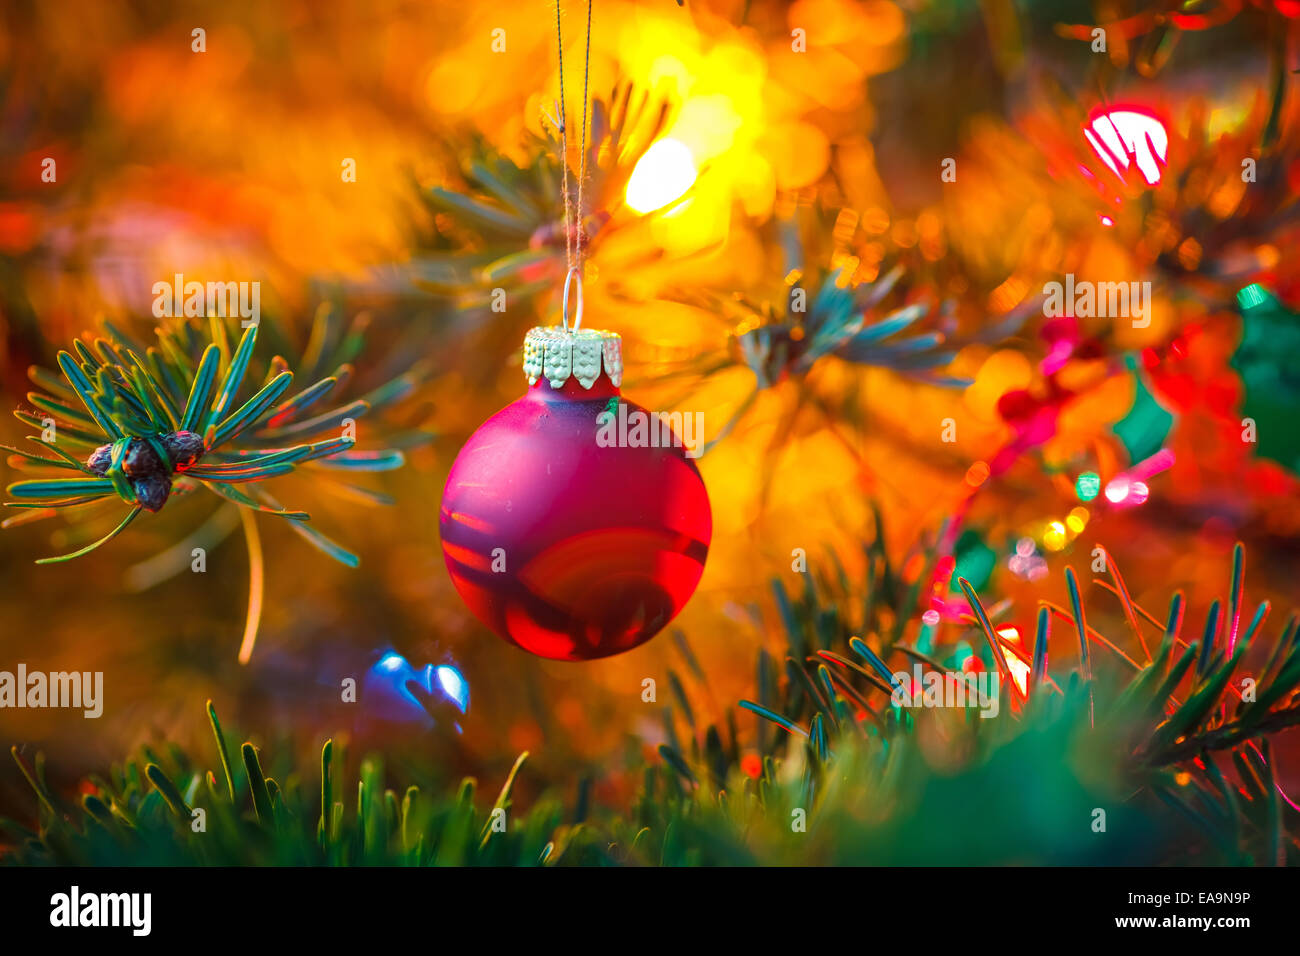 Decorated Christmas tree - Stock Image